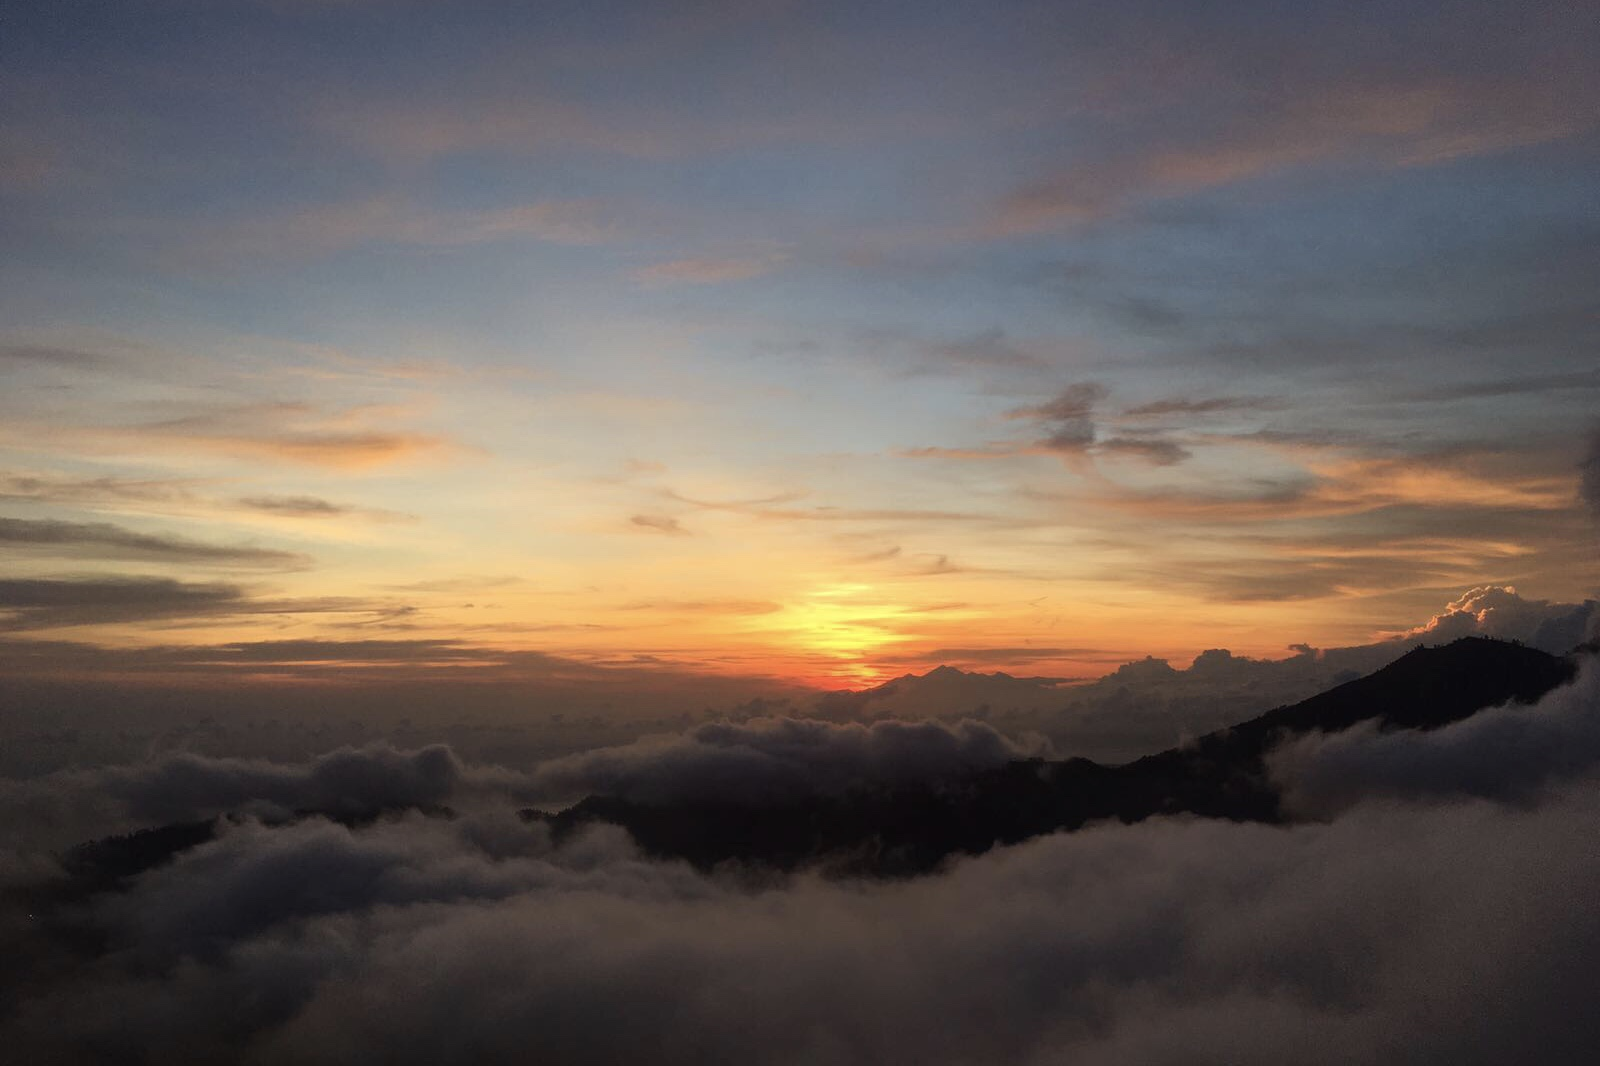 sunrise hike mount batur, zonsopgang batur vulkaan bali, activiteiten in ubud